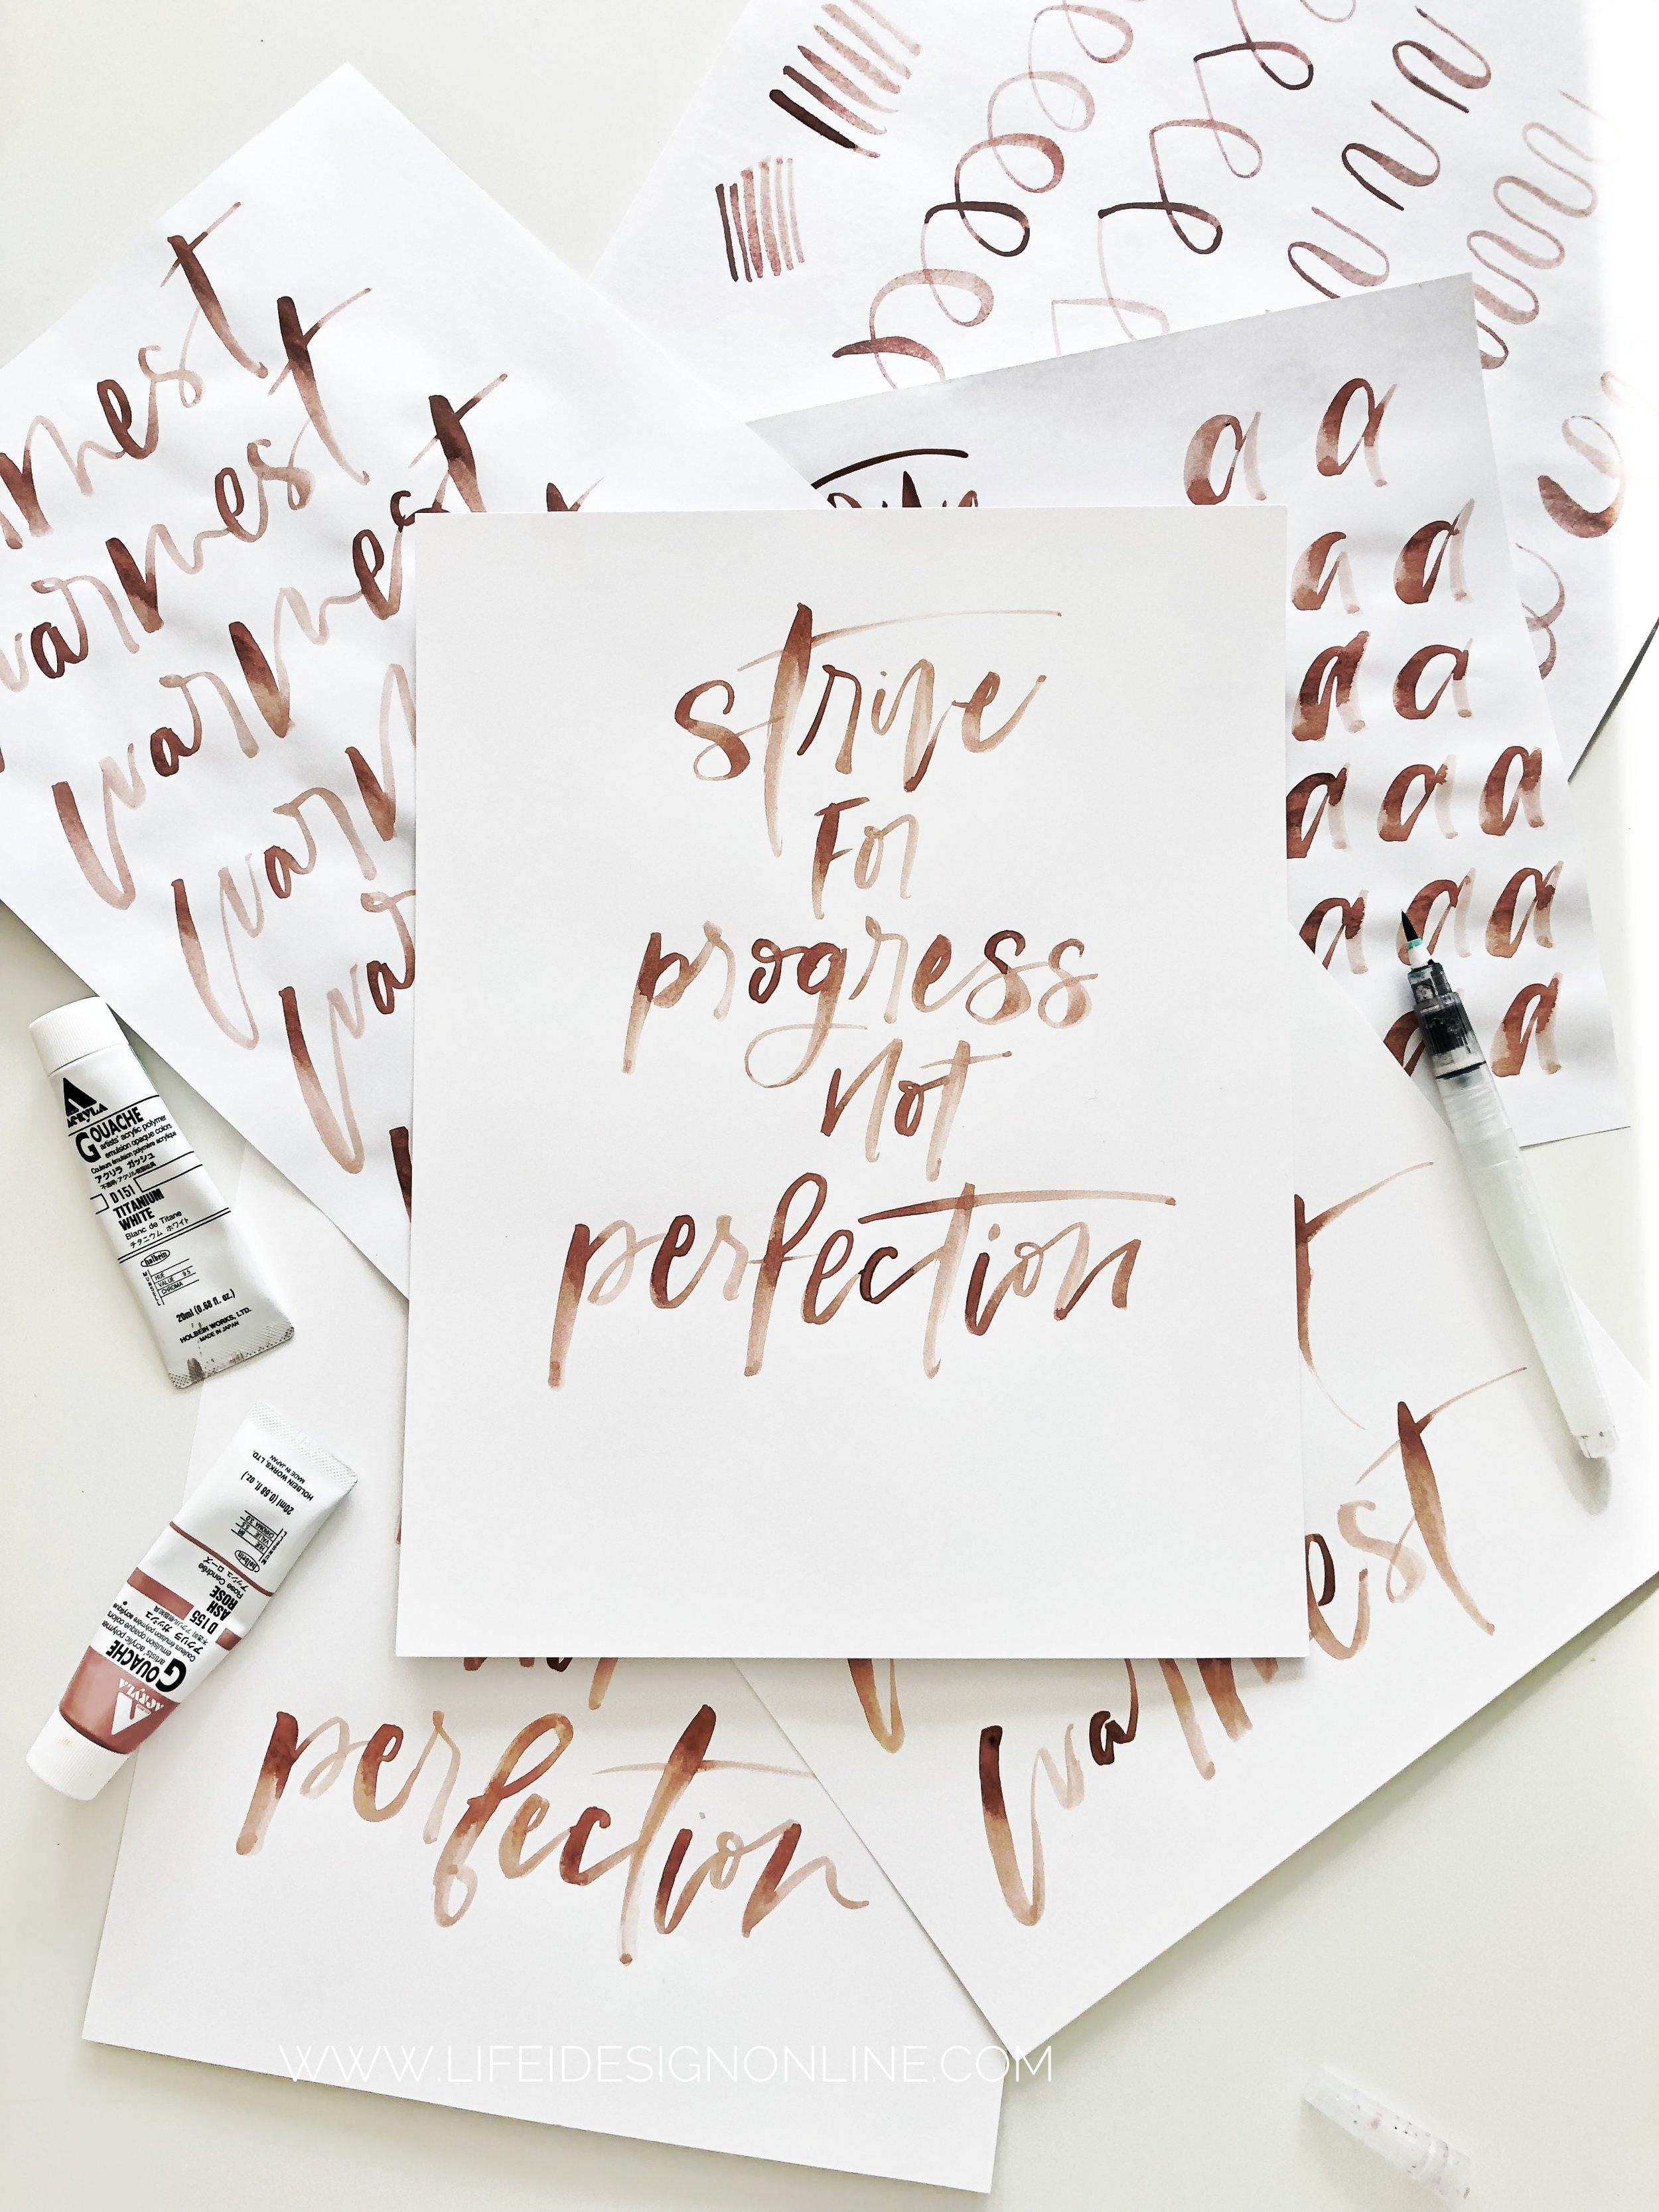 strive for progress quote.jpg